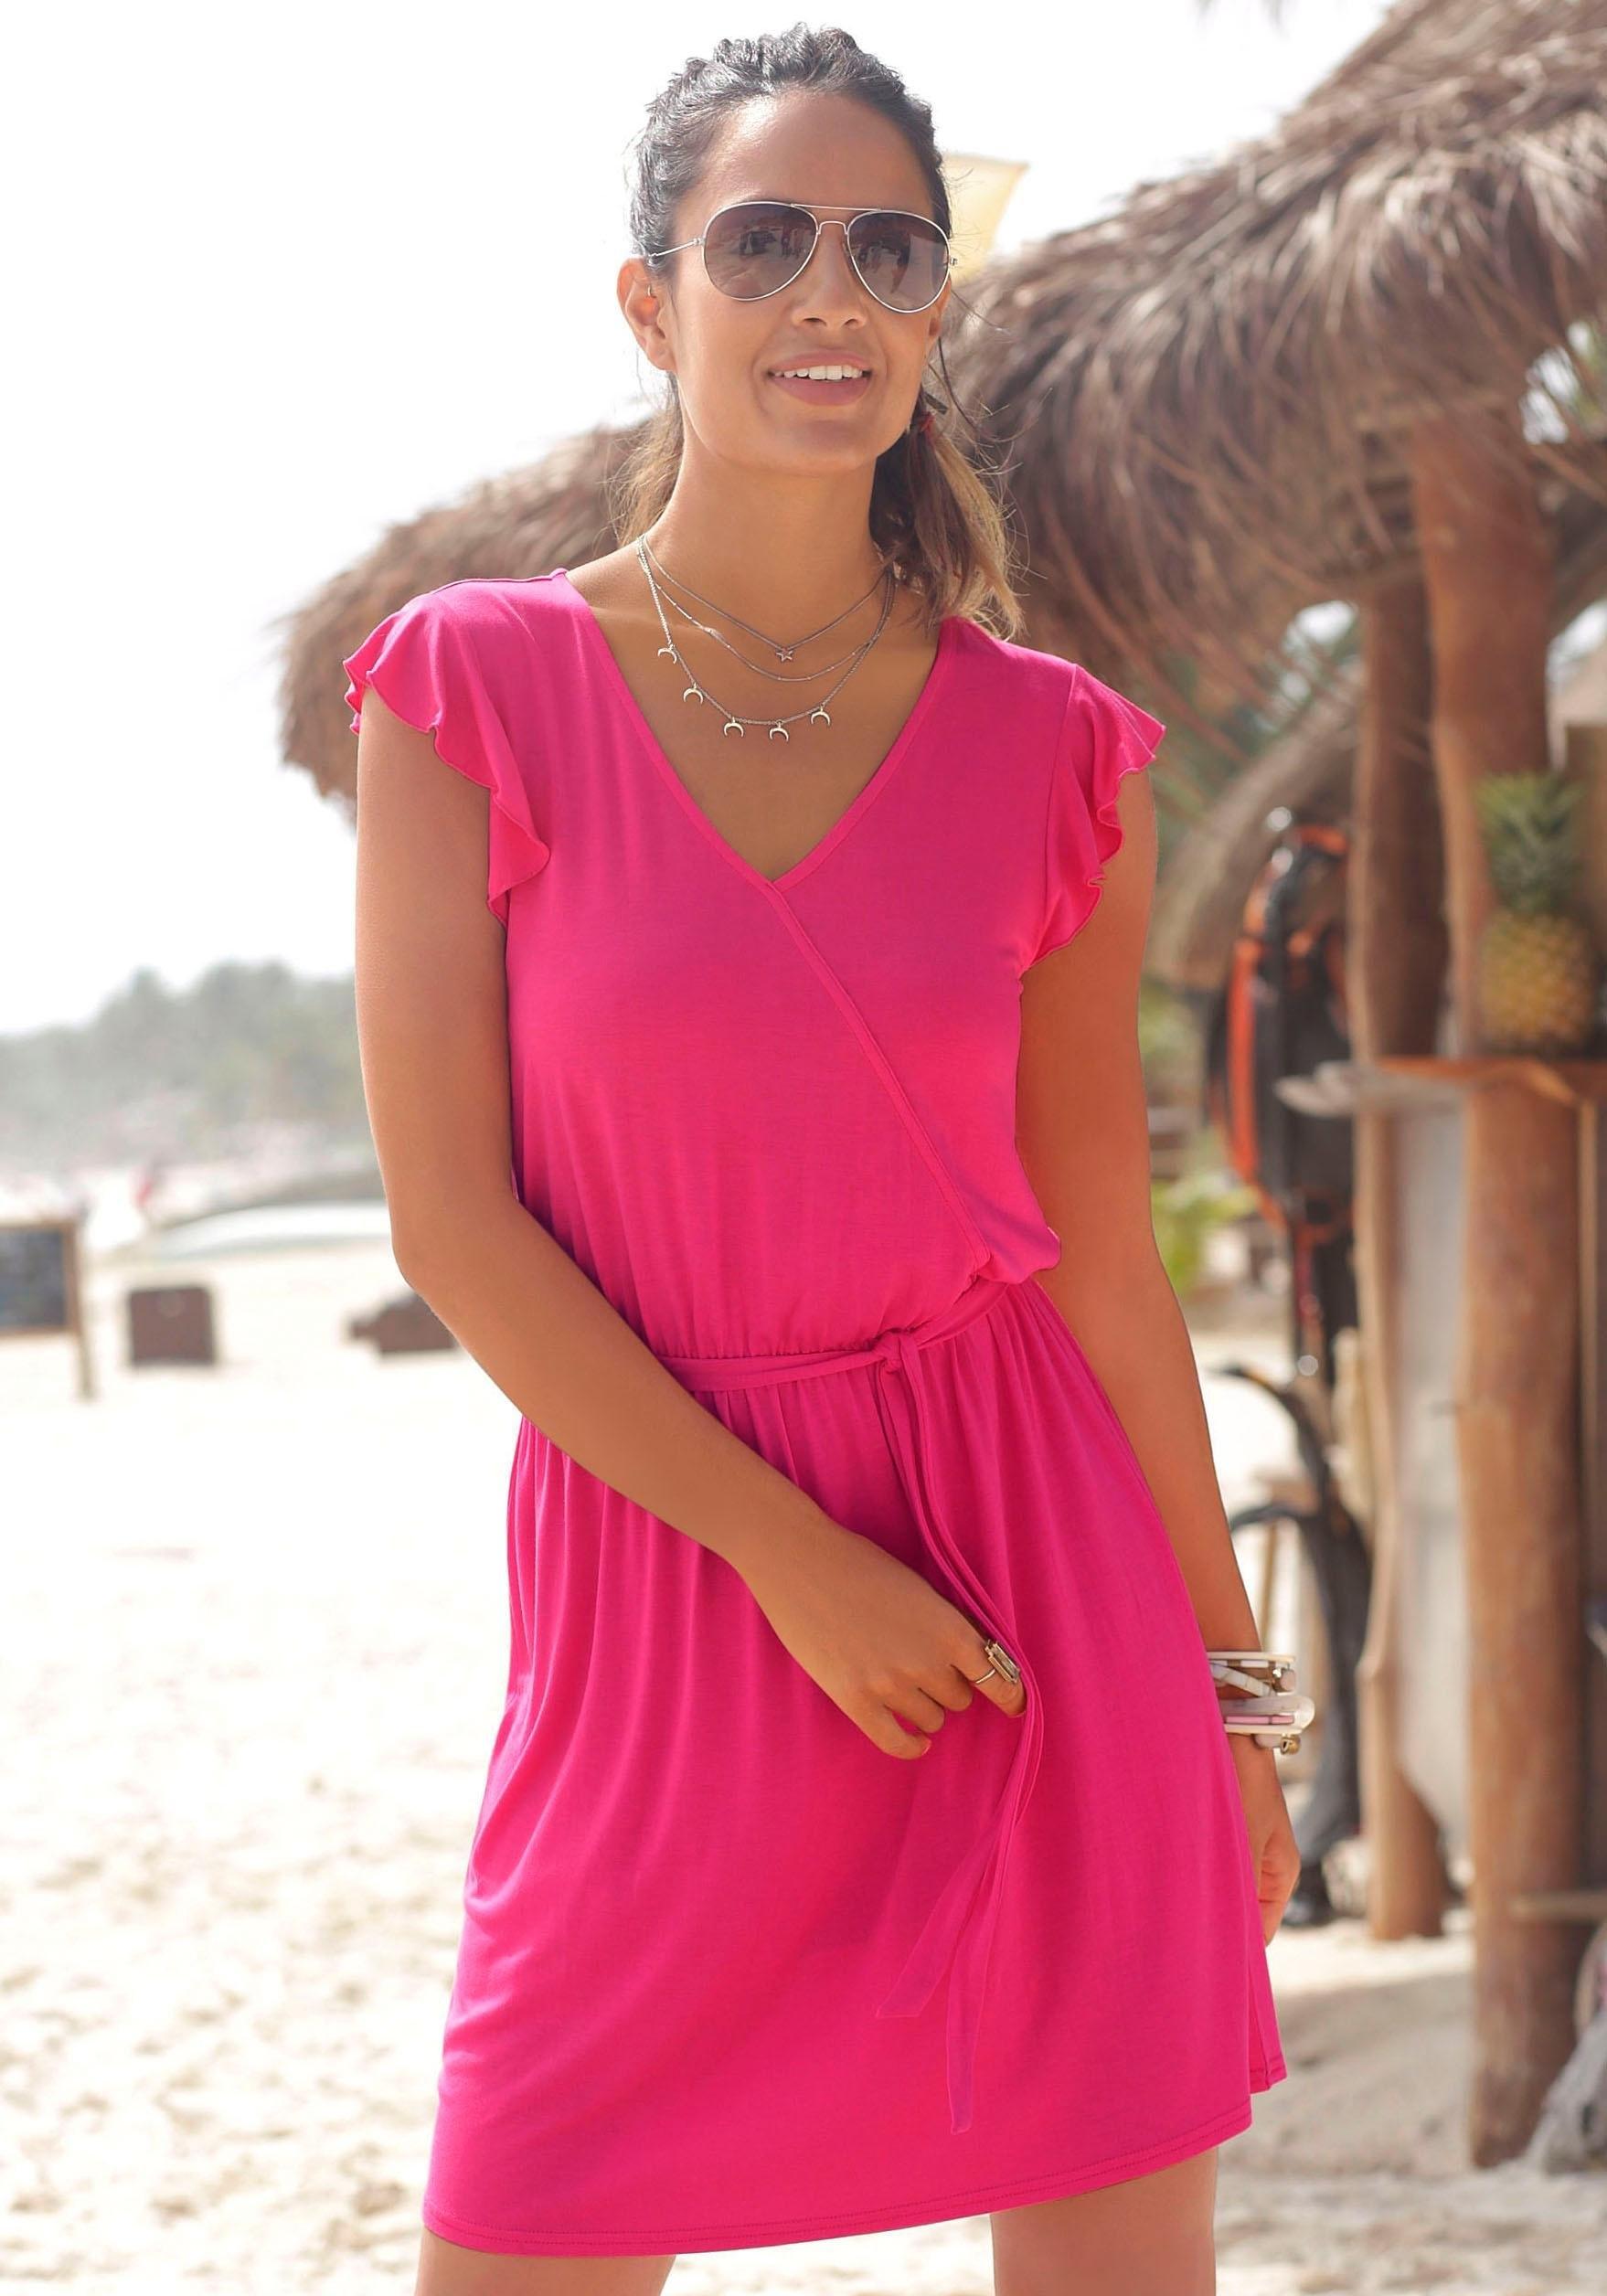 b3a0975c5c323f LASCANA strandjurk online shoppen | OTTO